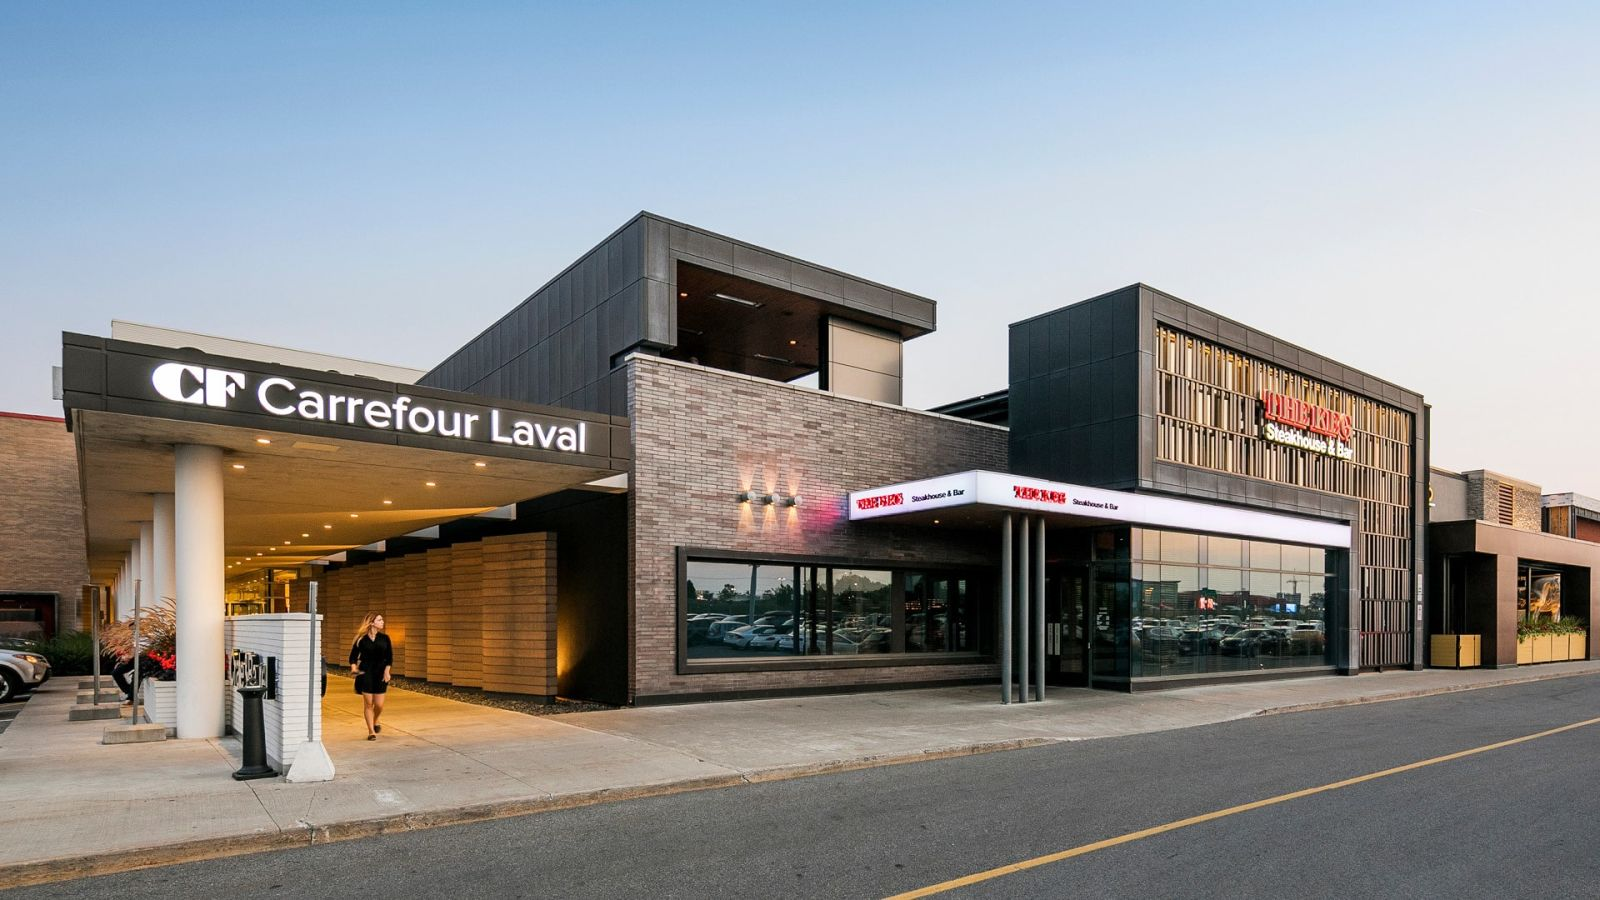 [CF Carrefour Laval] - Exterior Photo